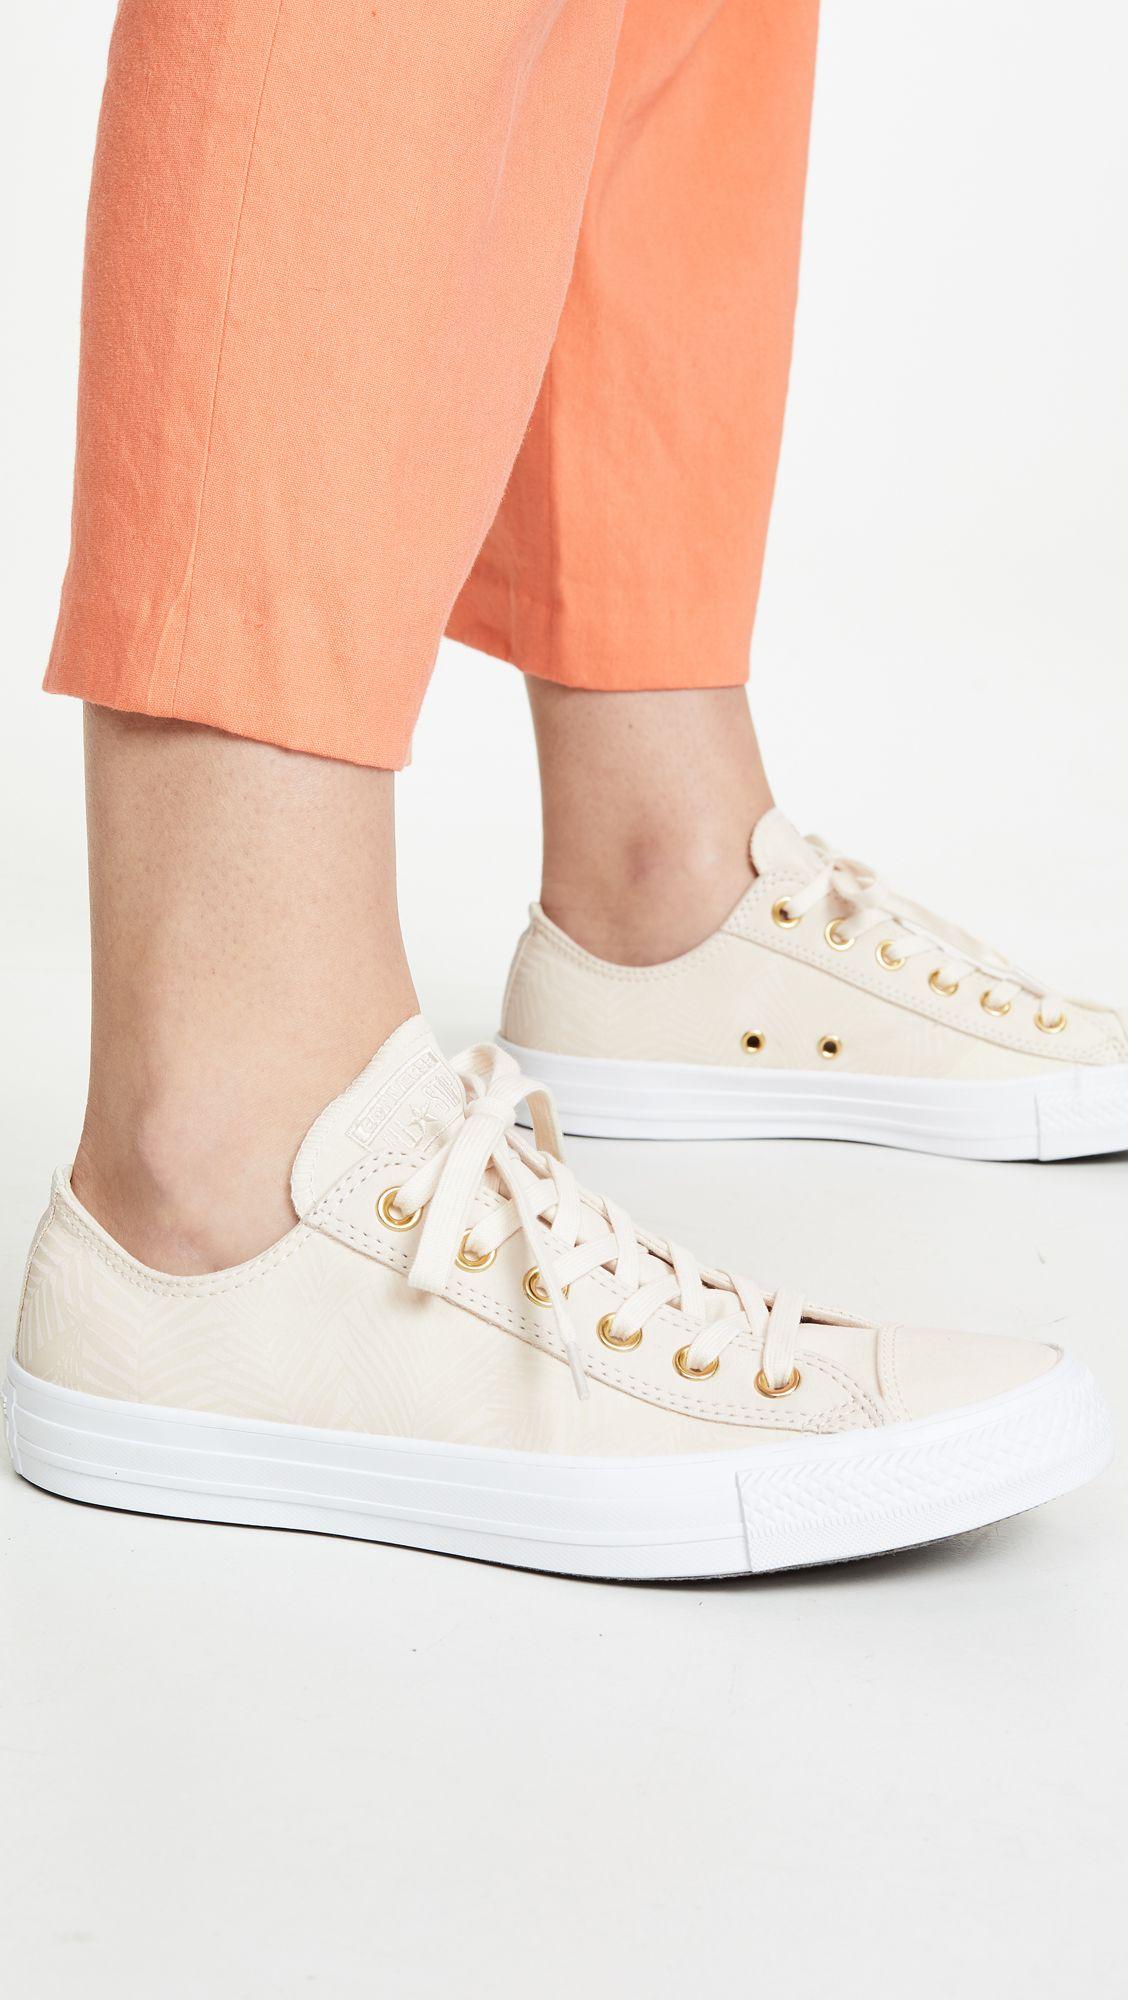 Converse Chuck Taylor All Star Summer Palm Sneakers   Chuck ...